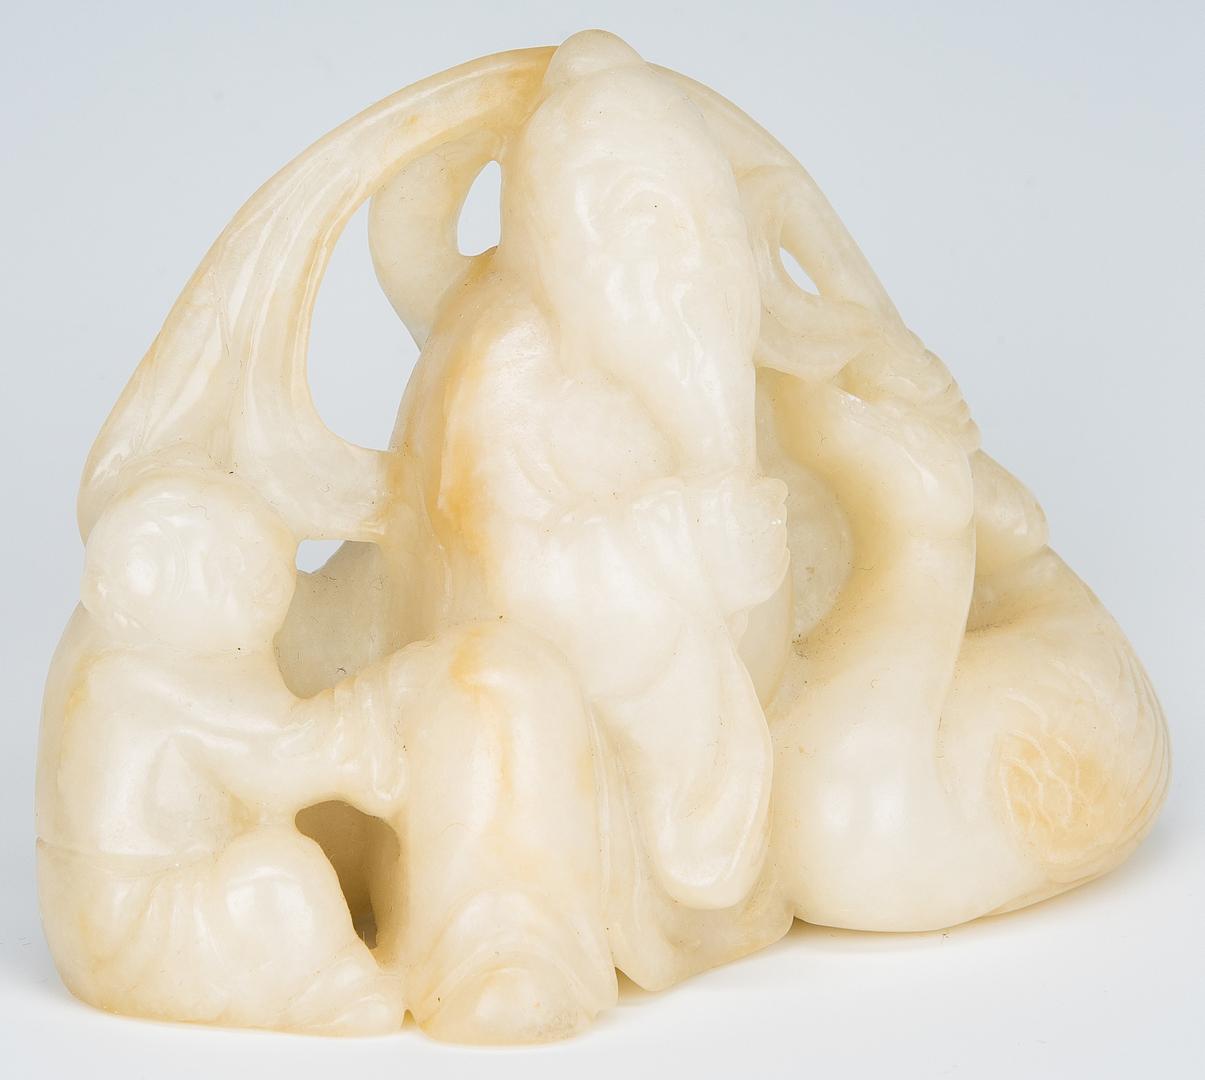 Lot 816: Chinese White Jade Scholar's Rock and Brush Pot